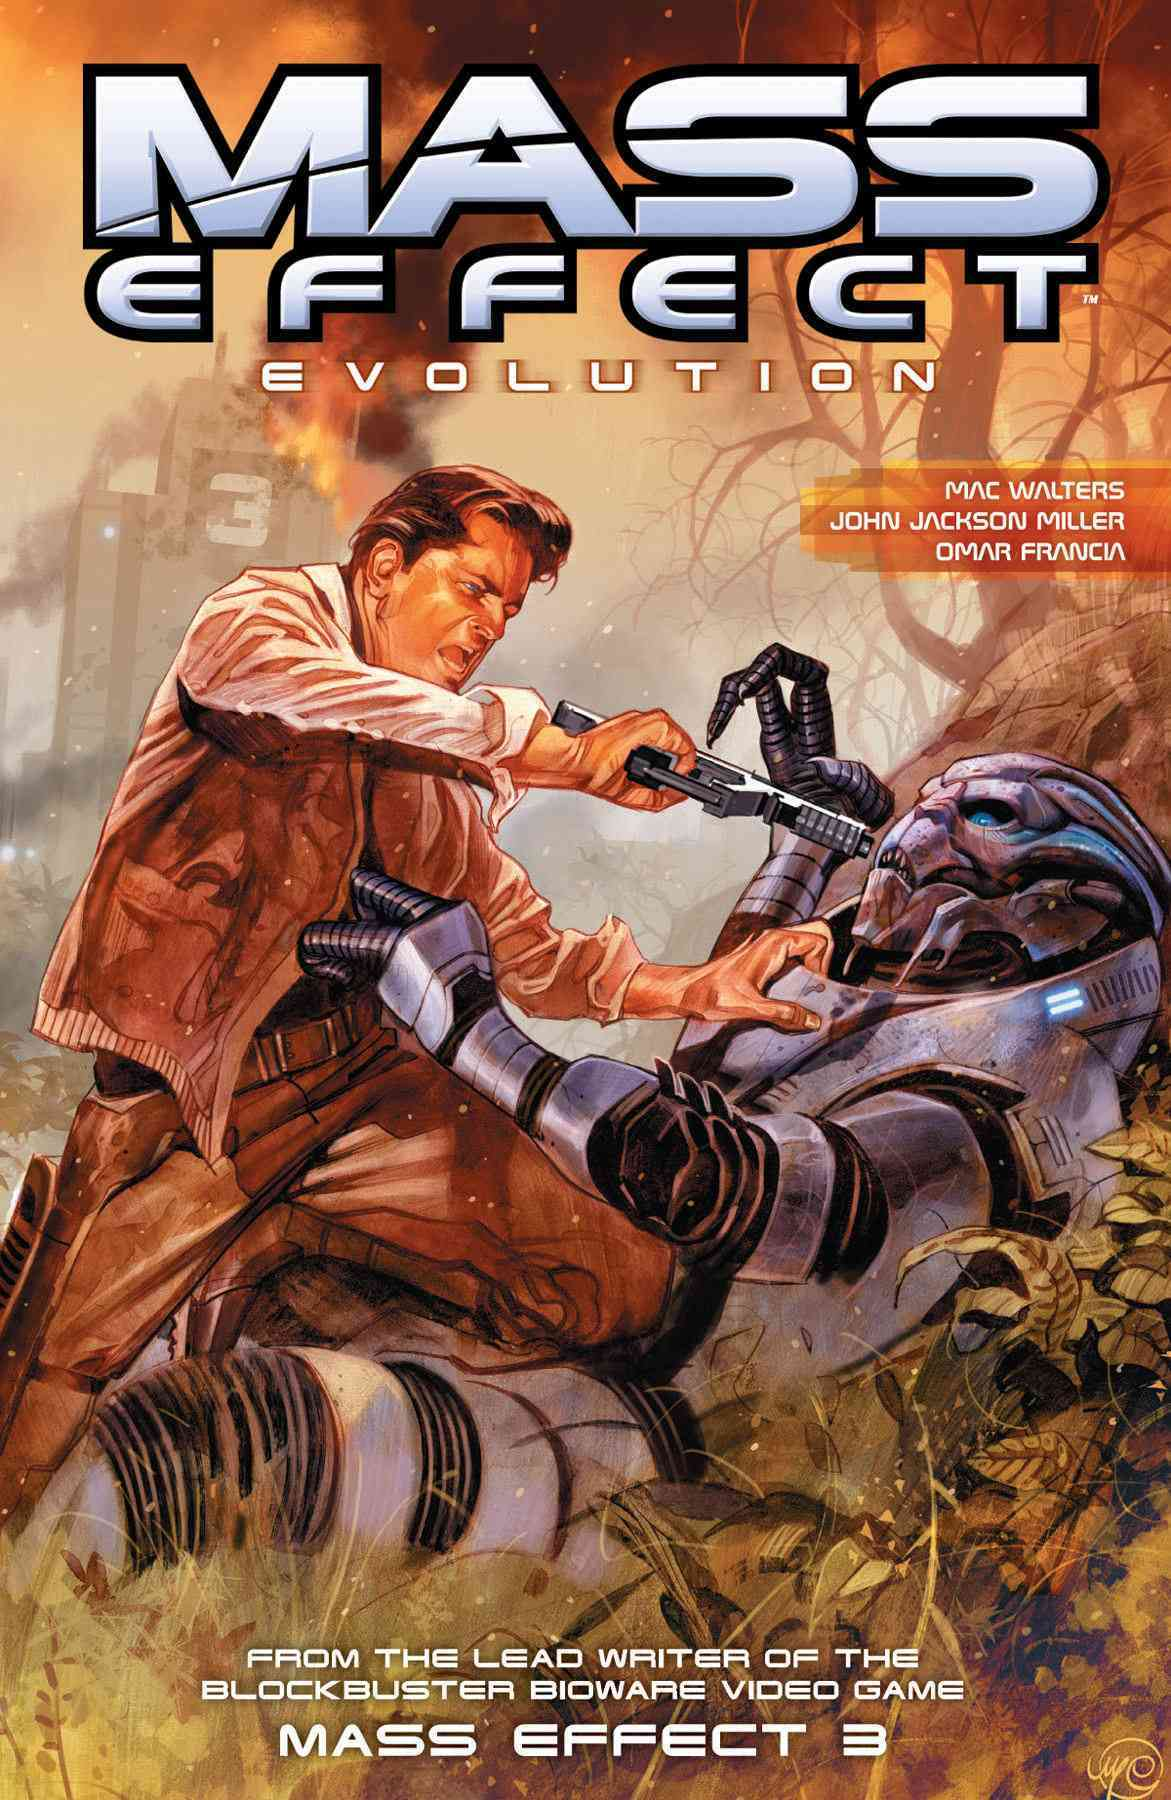 Mass Effect 2: Evolution (Paperback)